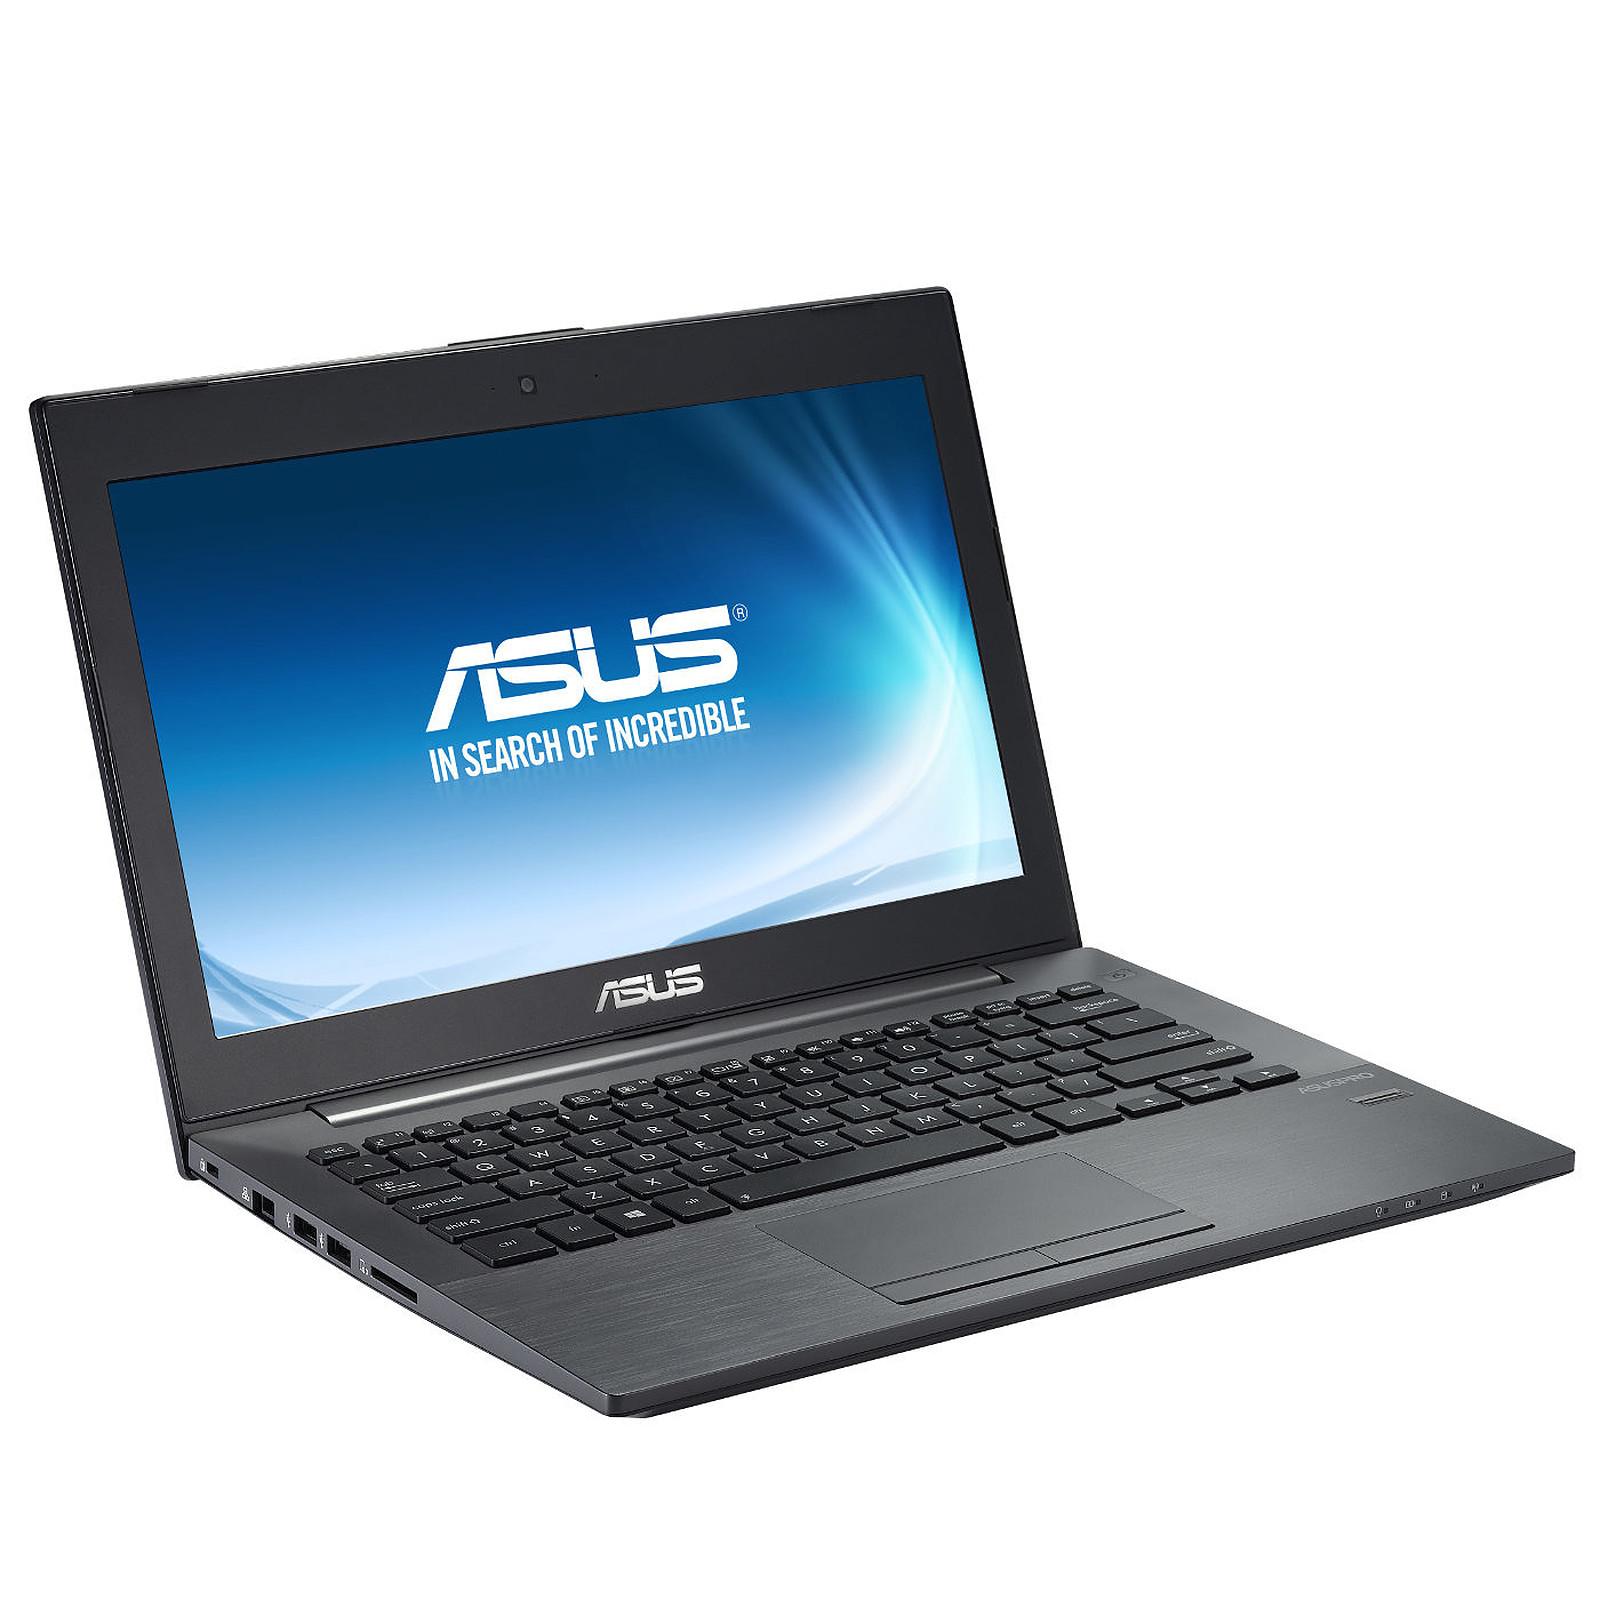 ASUS PU301LA-RO032G